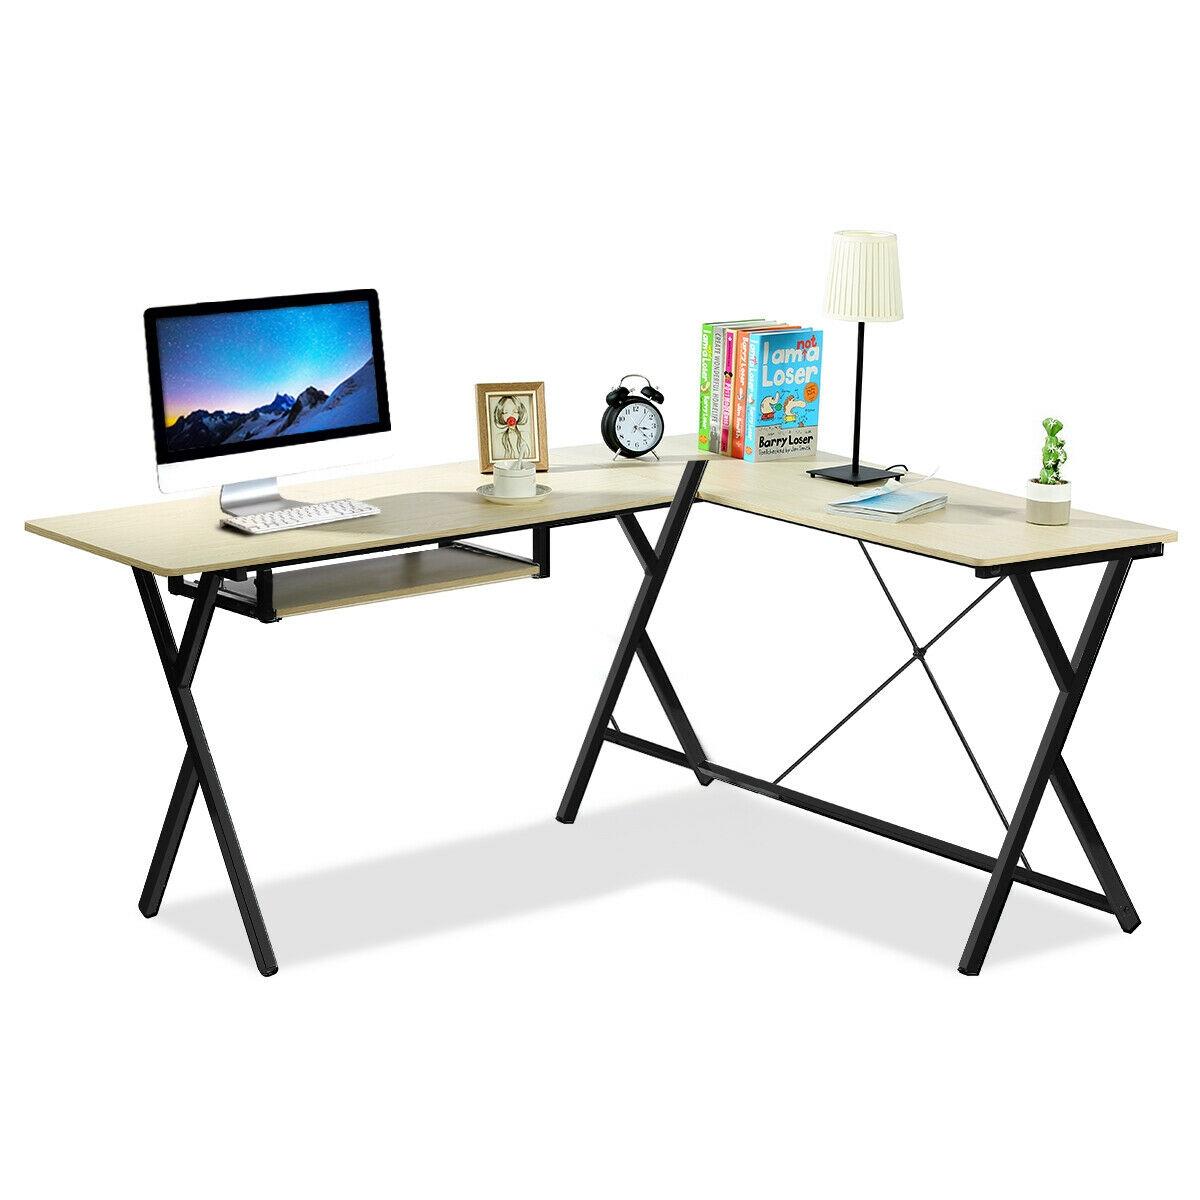 L-Shaped Computer Desk Corner Writing Desk PC Latop Table